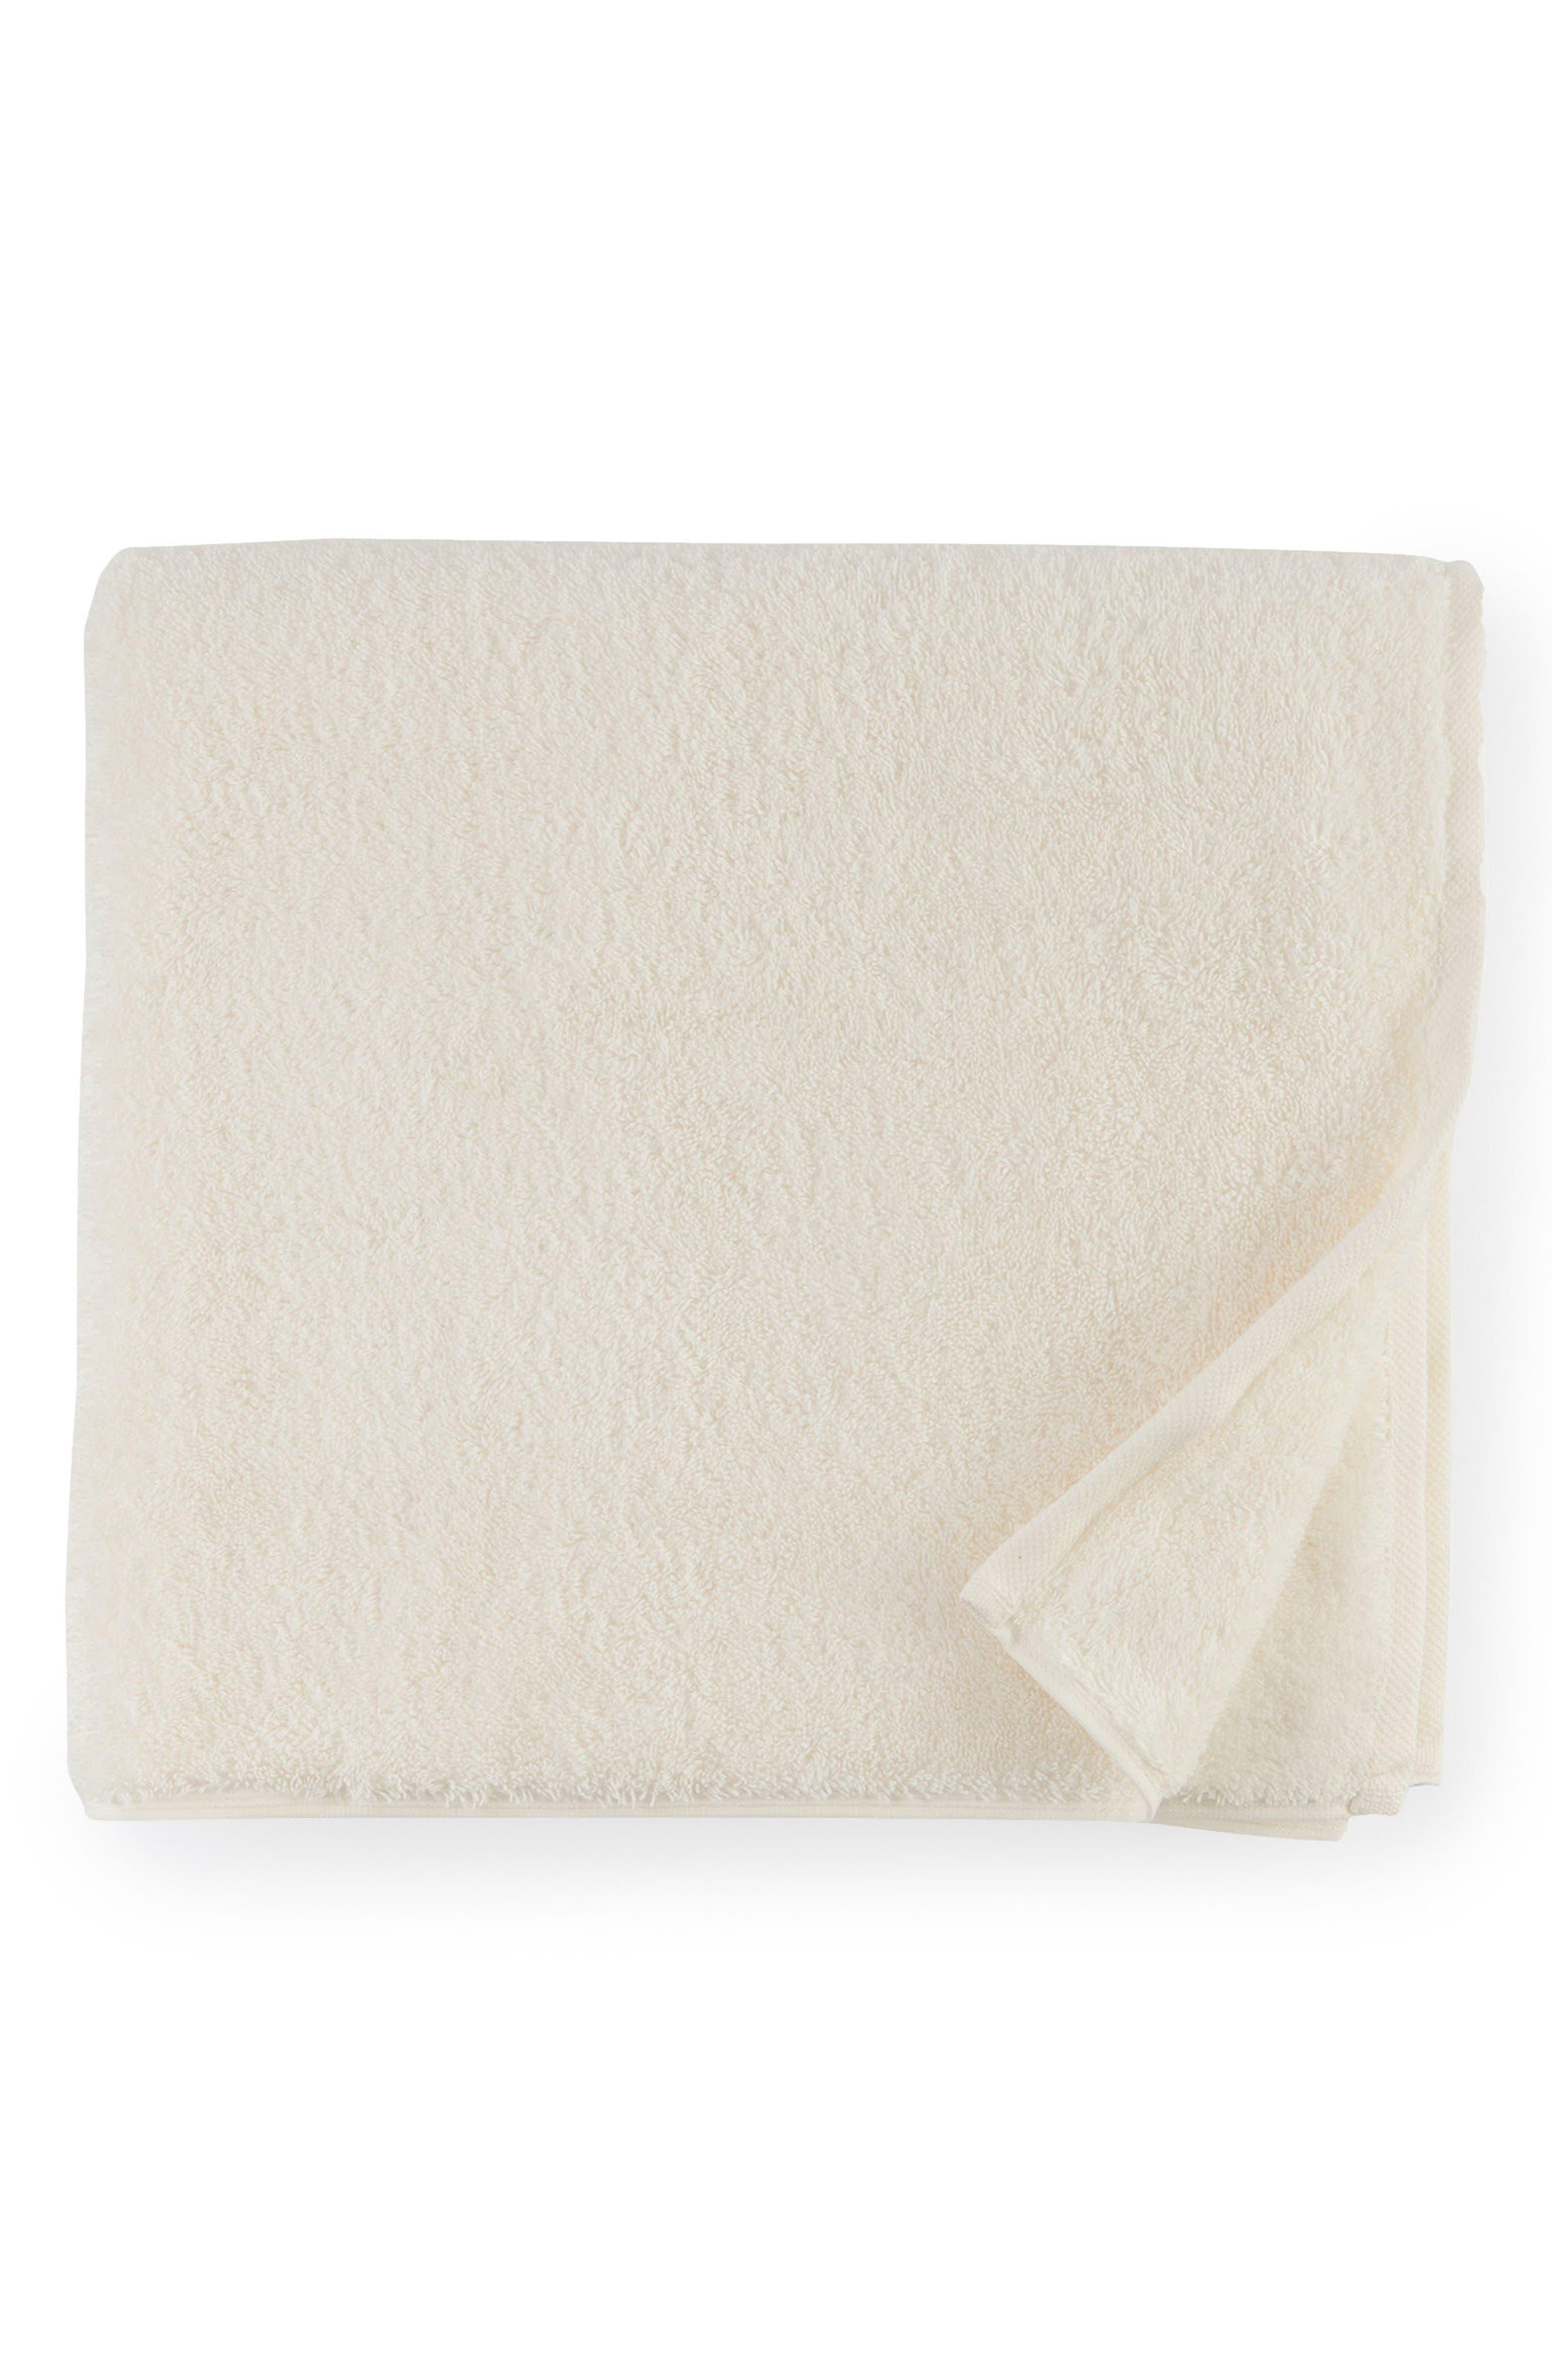 Alternate Image 1 Selected - SFERRA Sarma Hand Towel